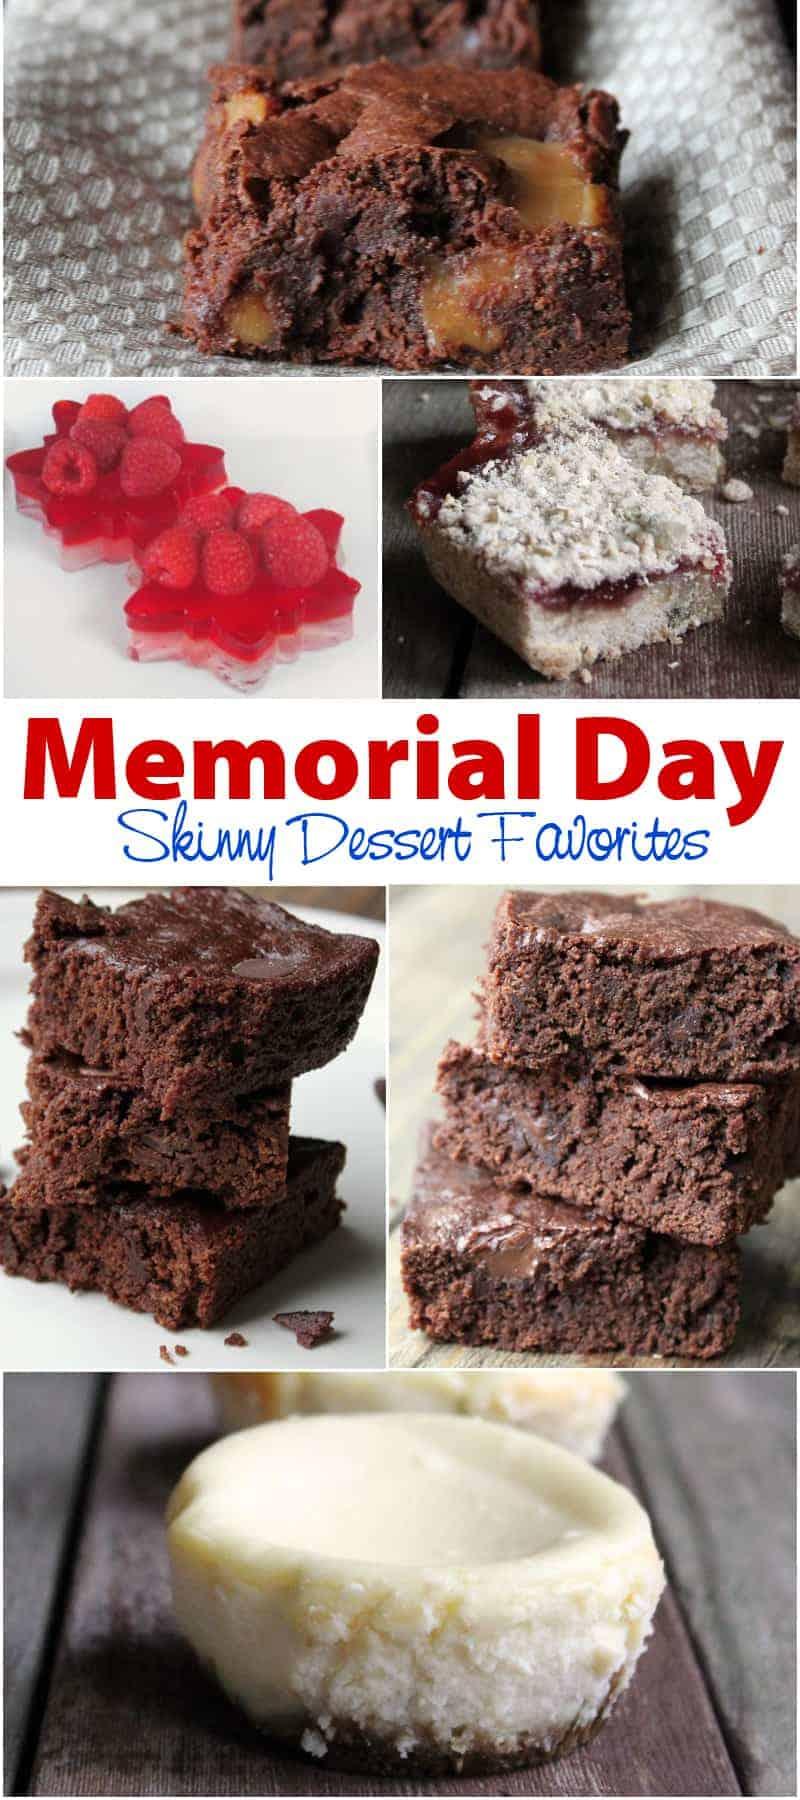 20+ Memorial Day Skinny Dessert Recipes